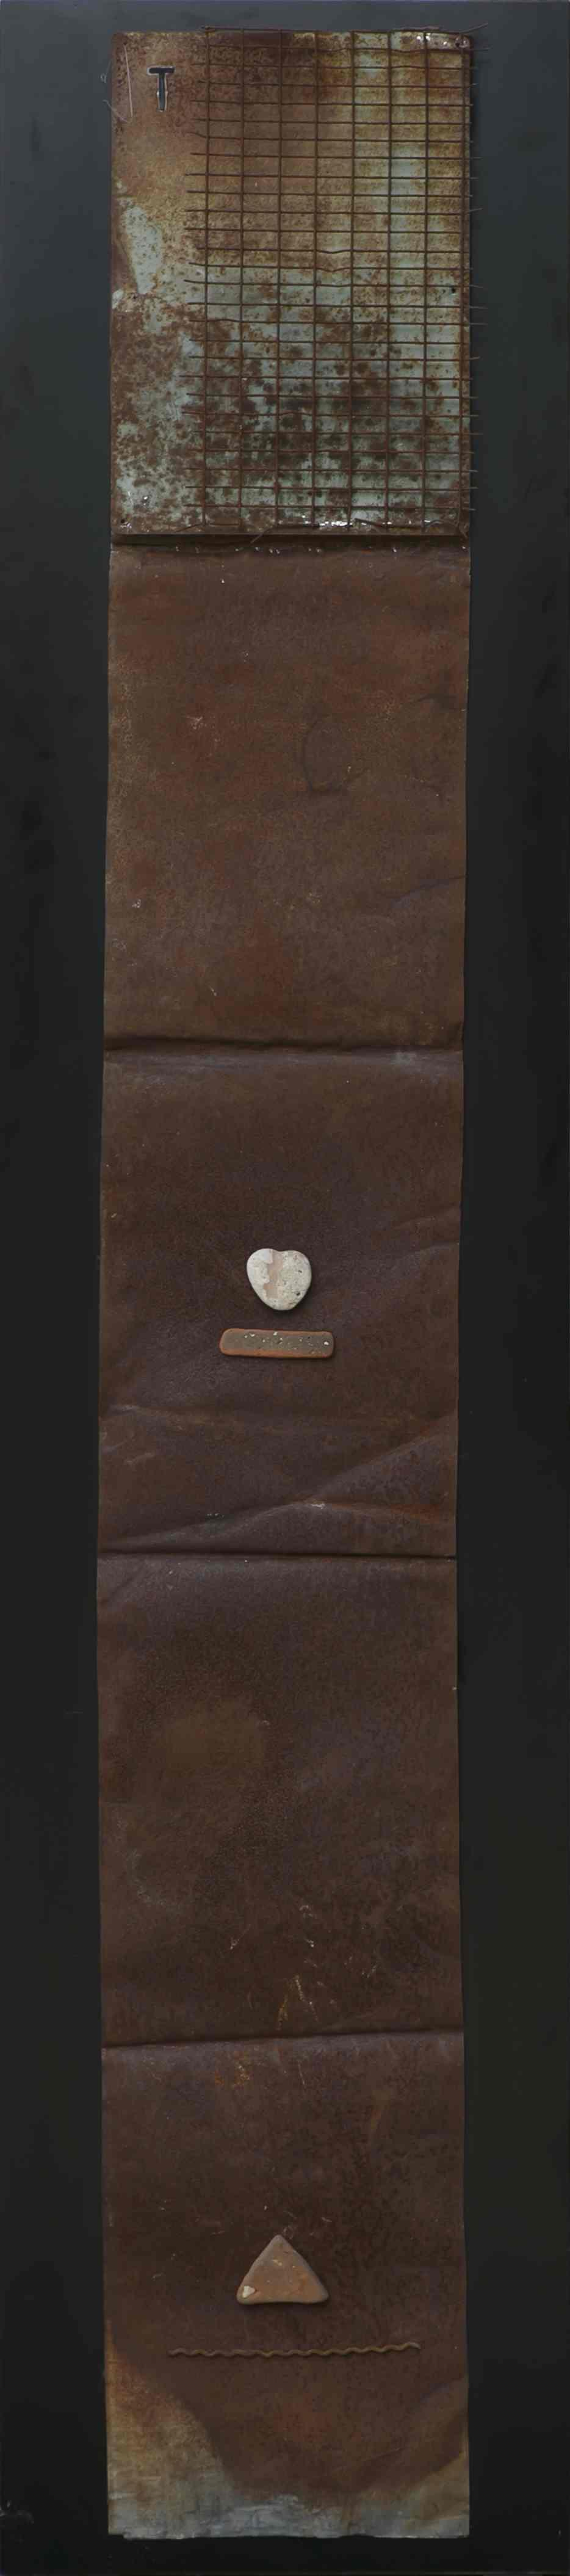 Stele n°4, ferro corroso, sasso su tavola, 175x40, 2000